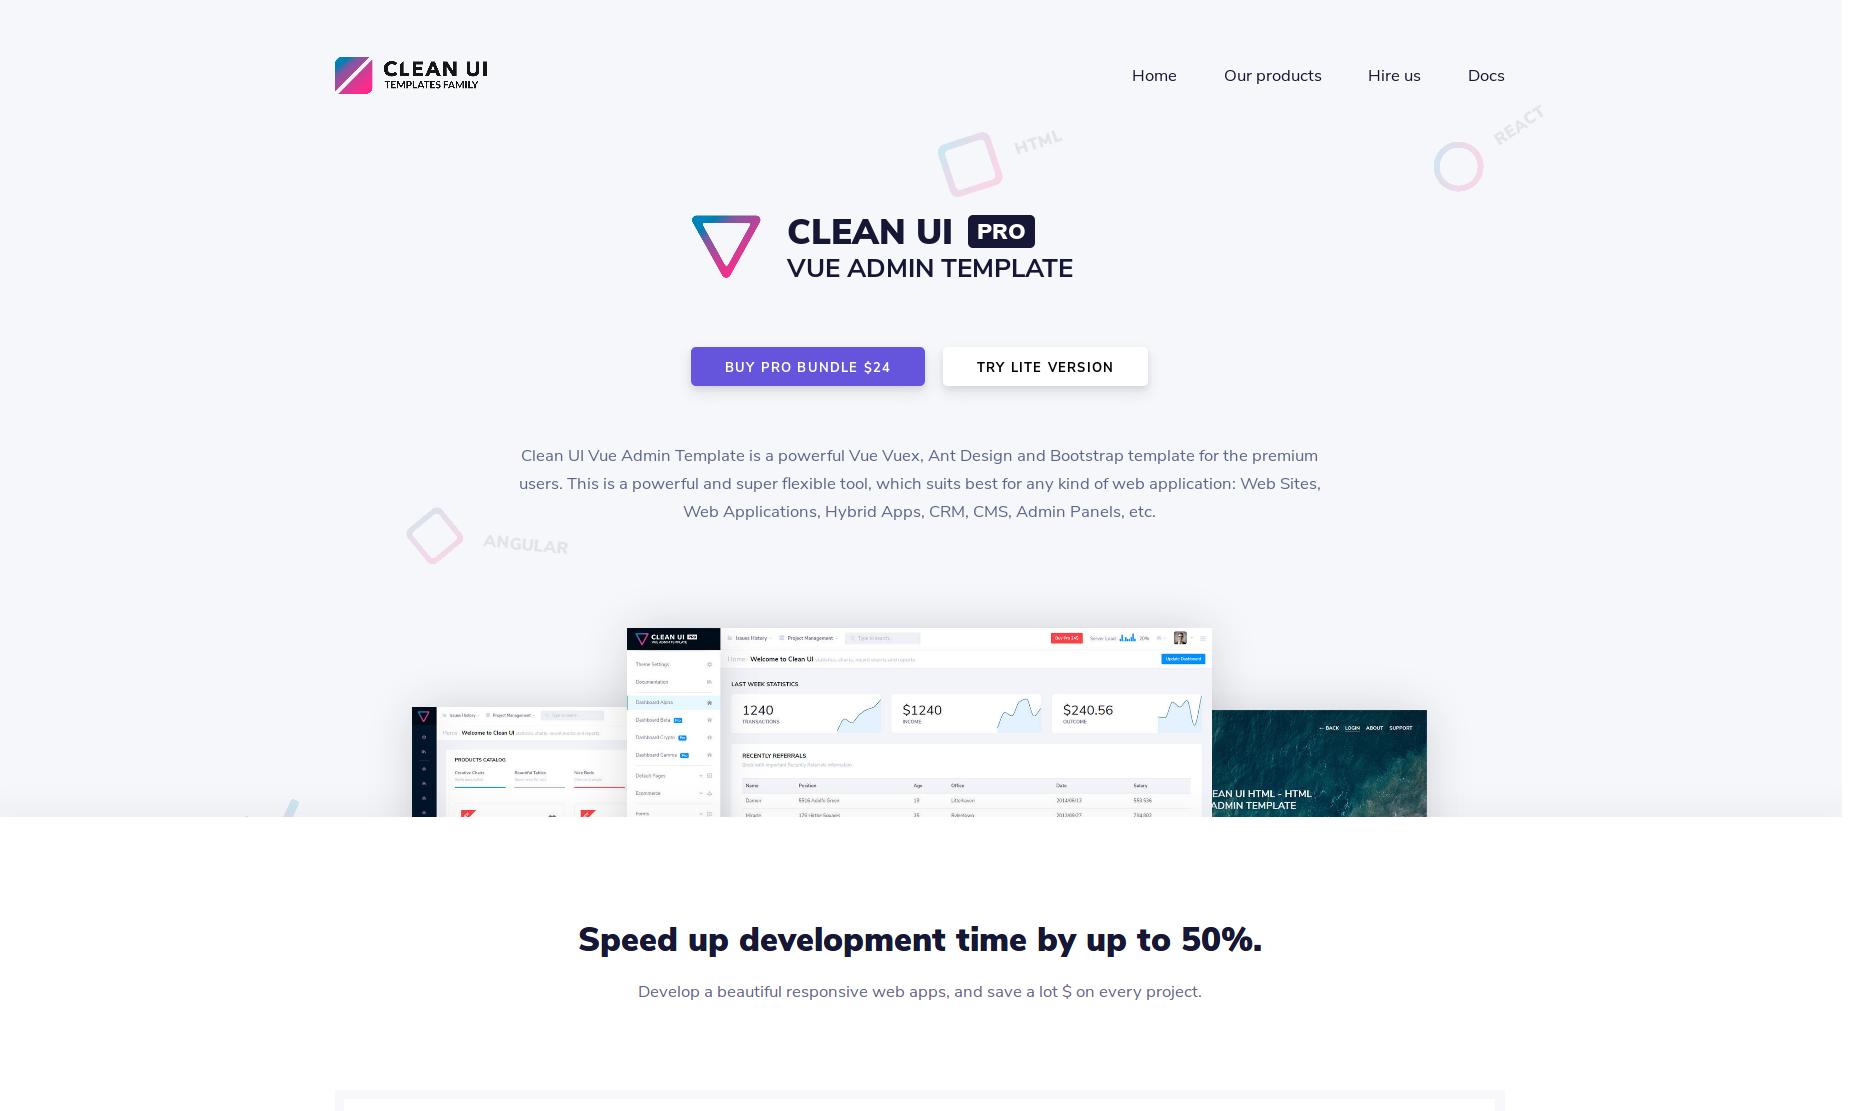 Clean UI Vue Admin Template